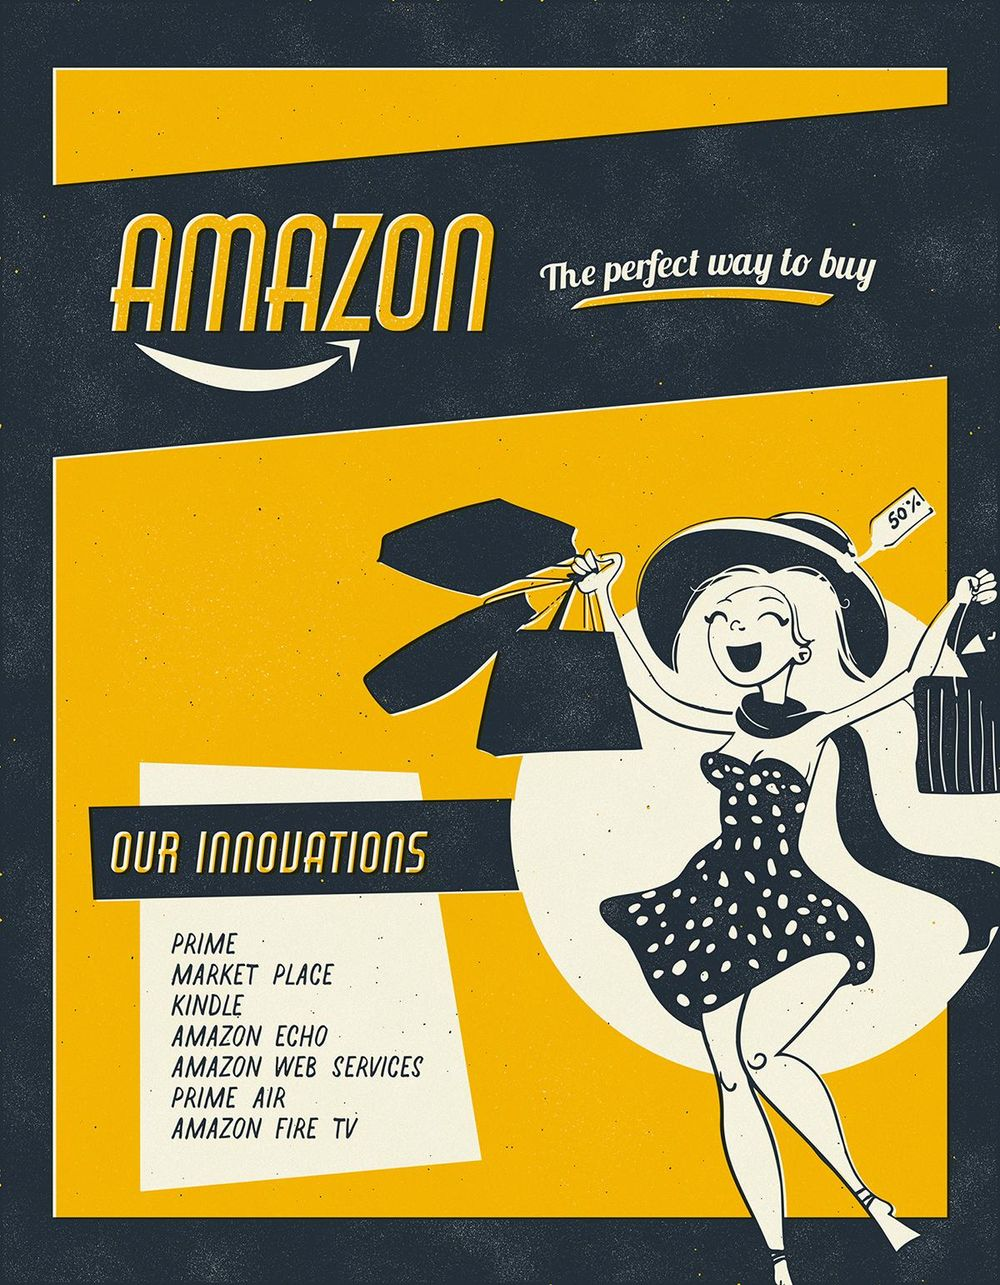 Amazon - image 3 - student project